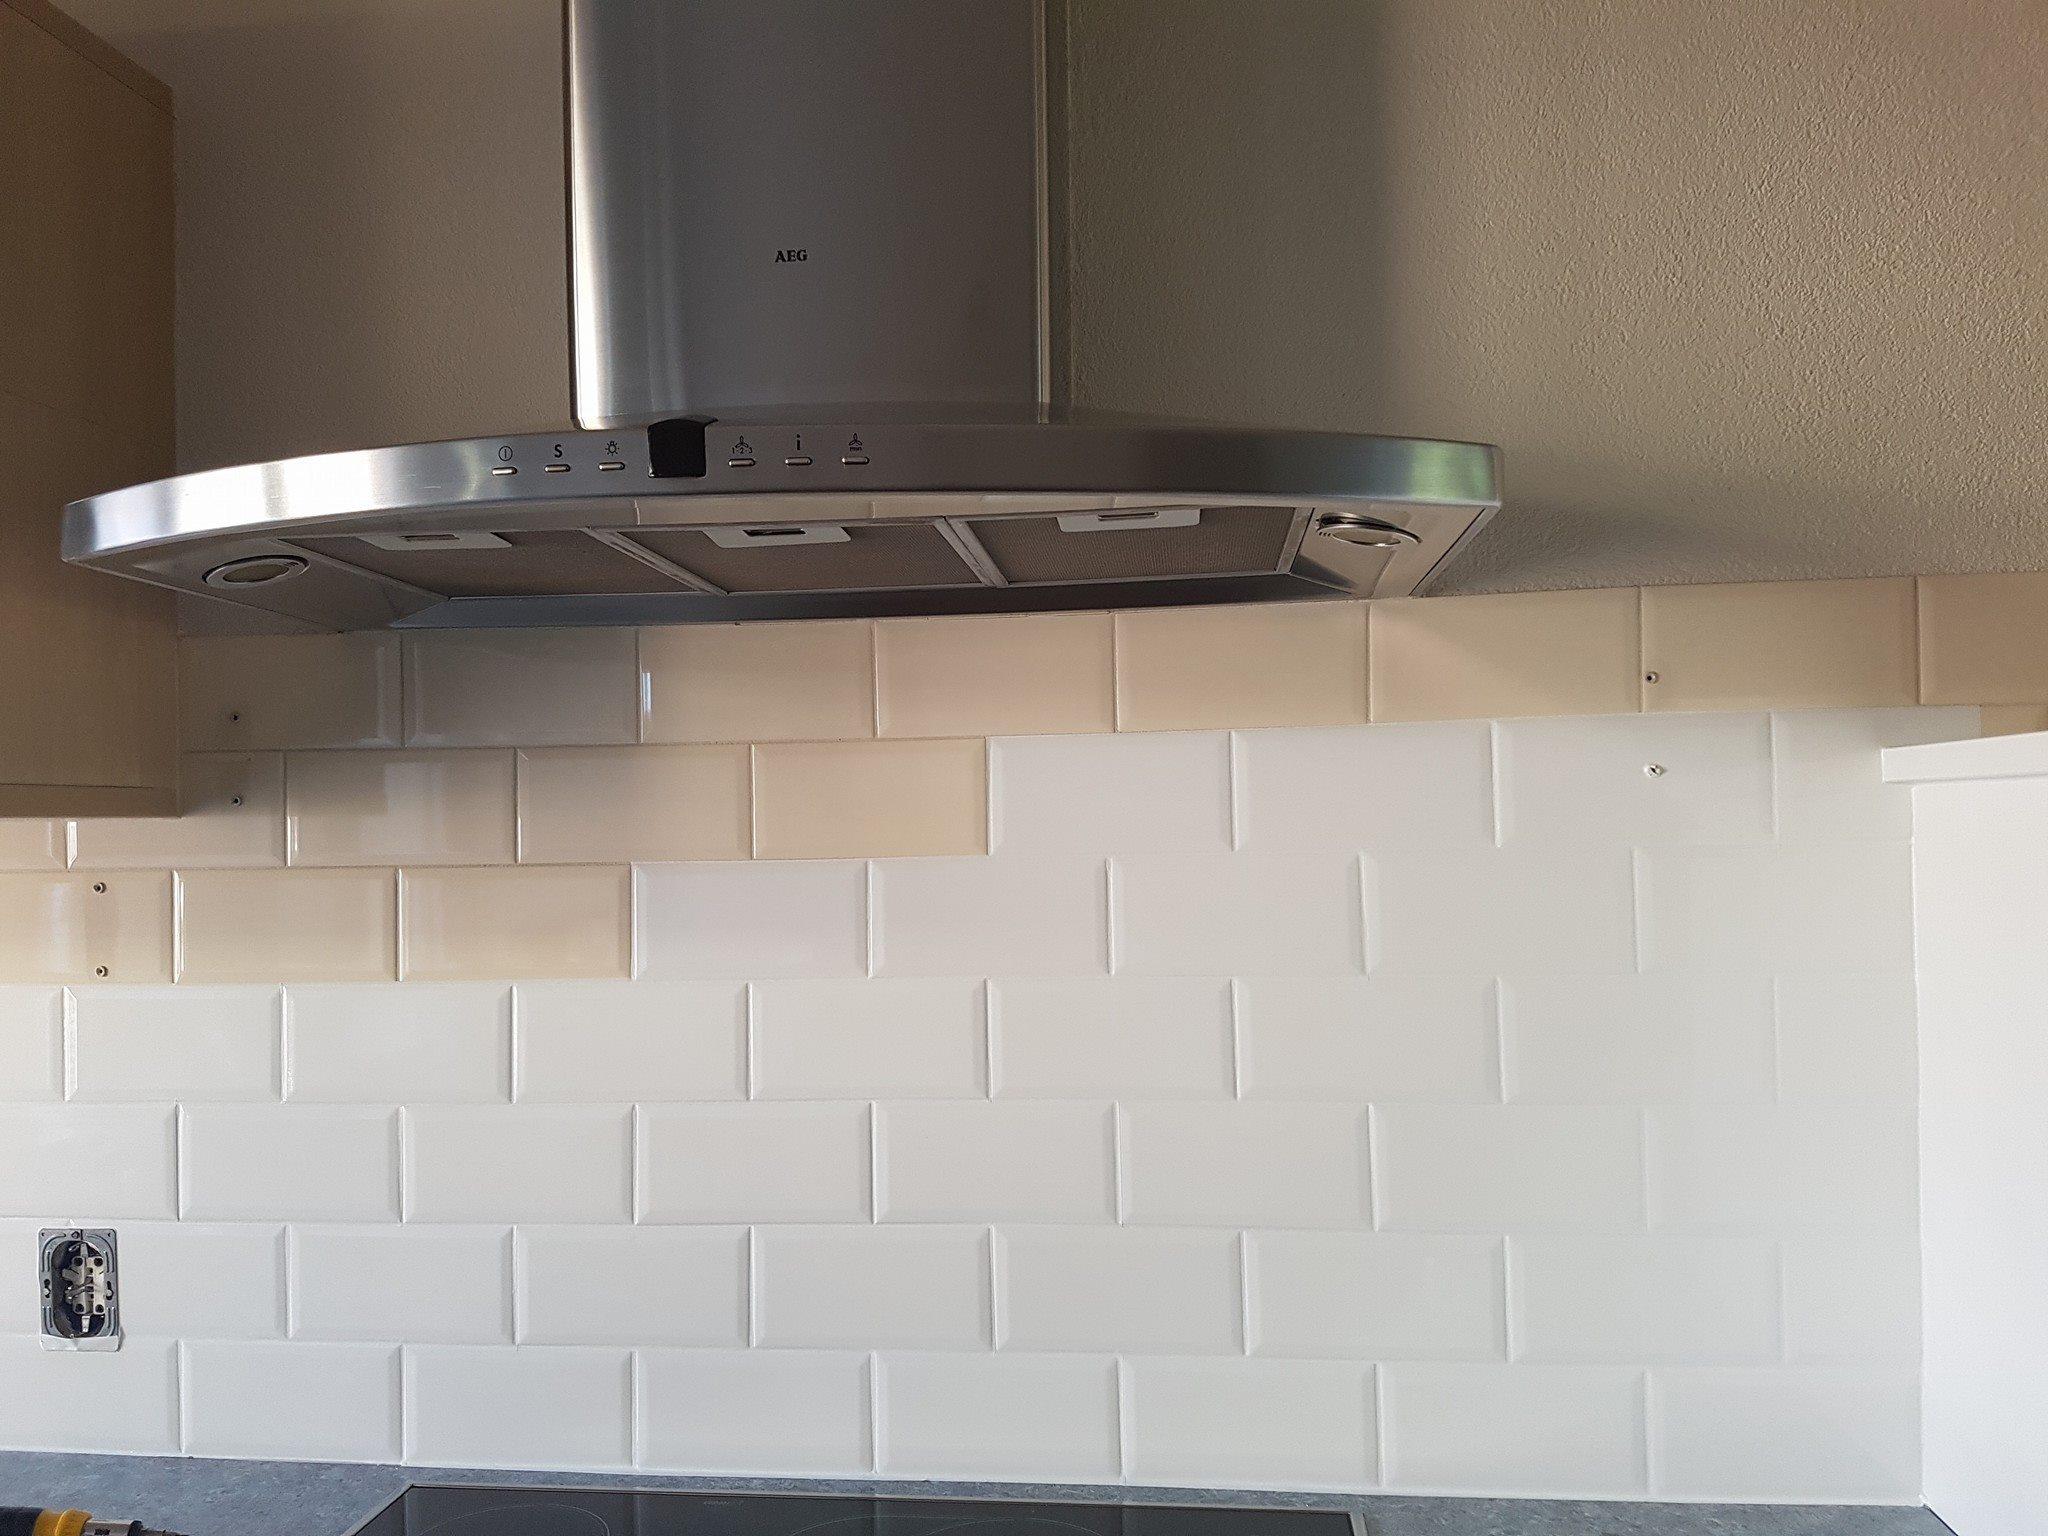 Glad Keuken Achterwand : Tegels en achterwanden